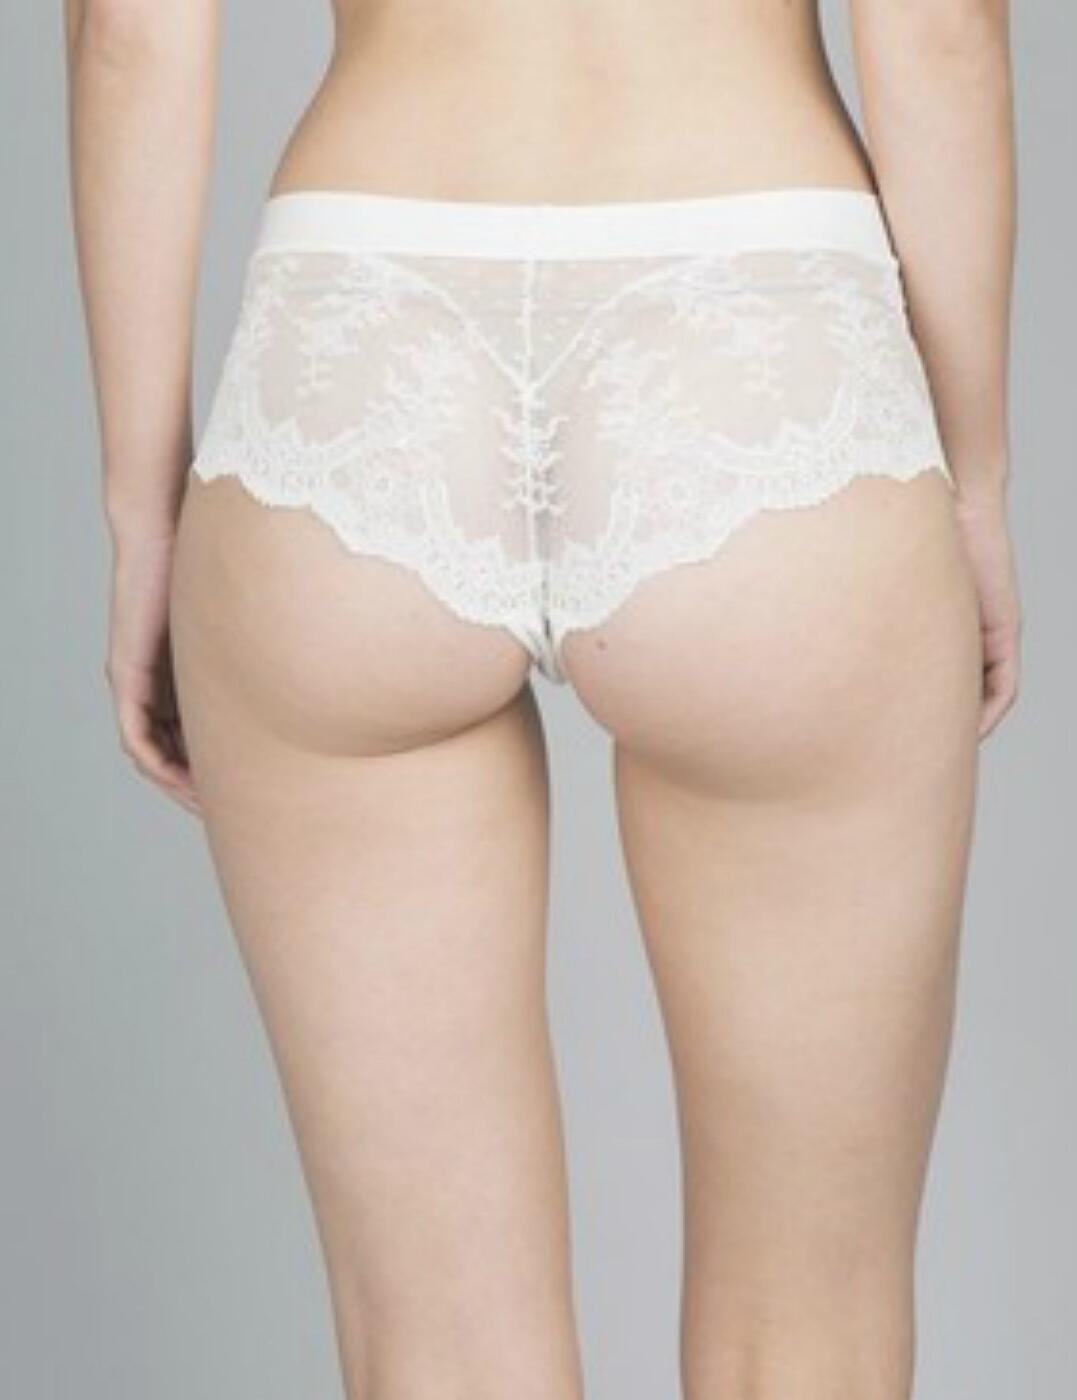 Maison Lejaby Demoiselle Boxer Short Knickers 31669 Womens Luxury Lignerie